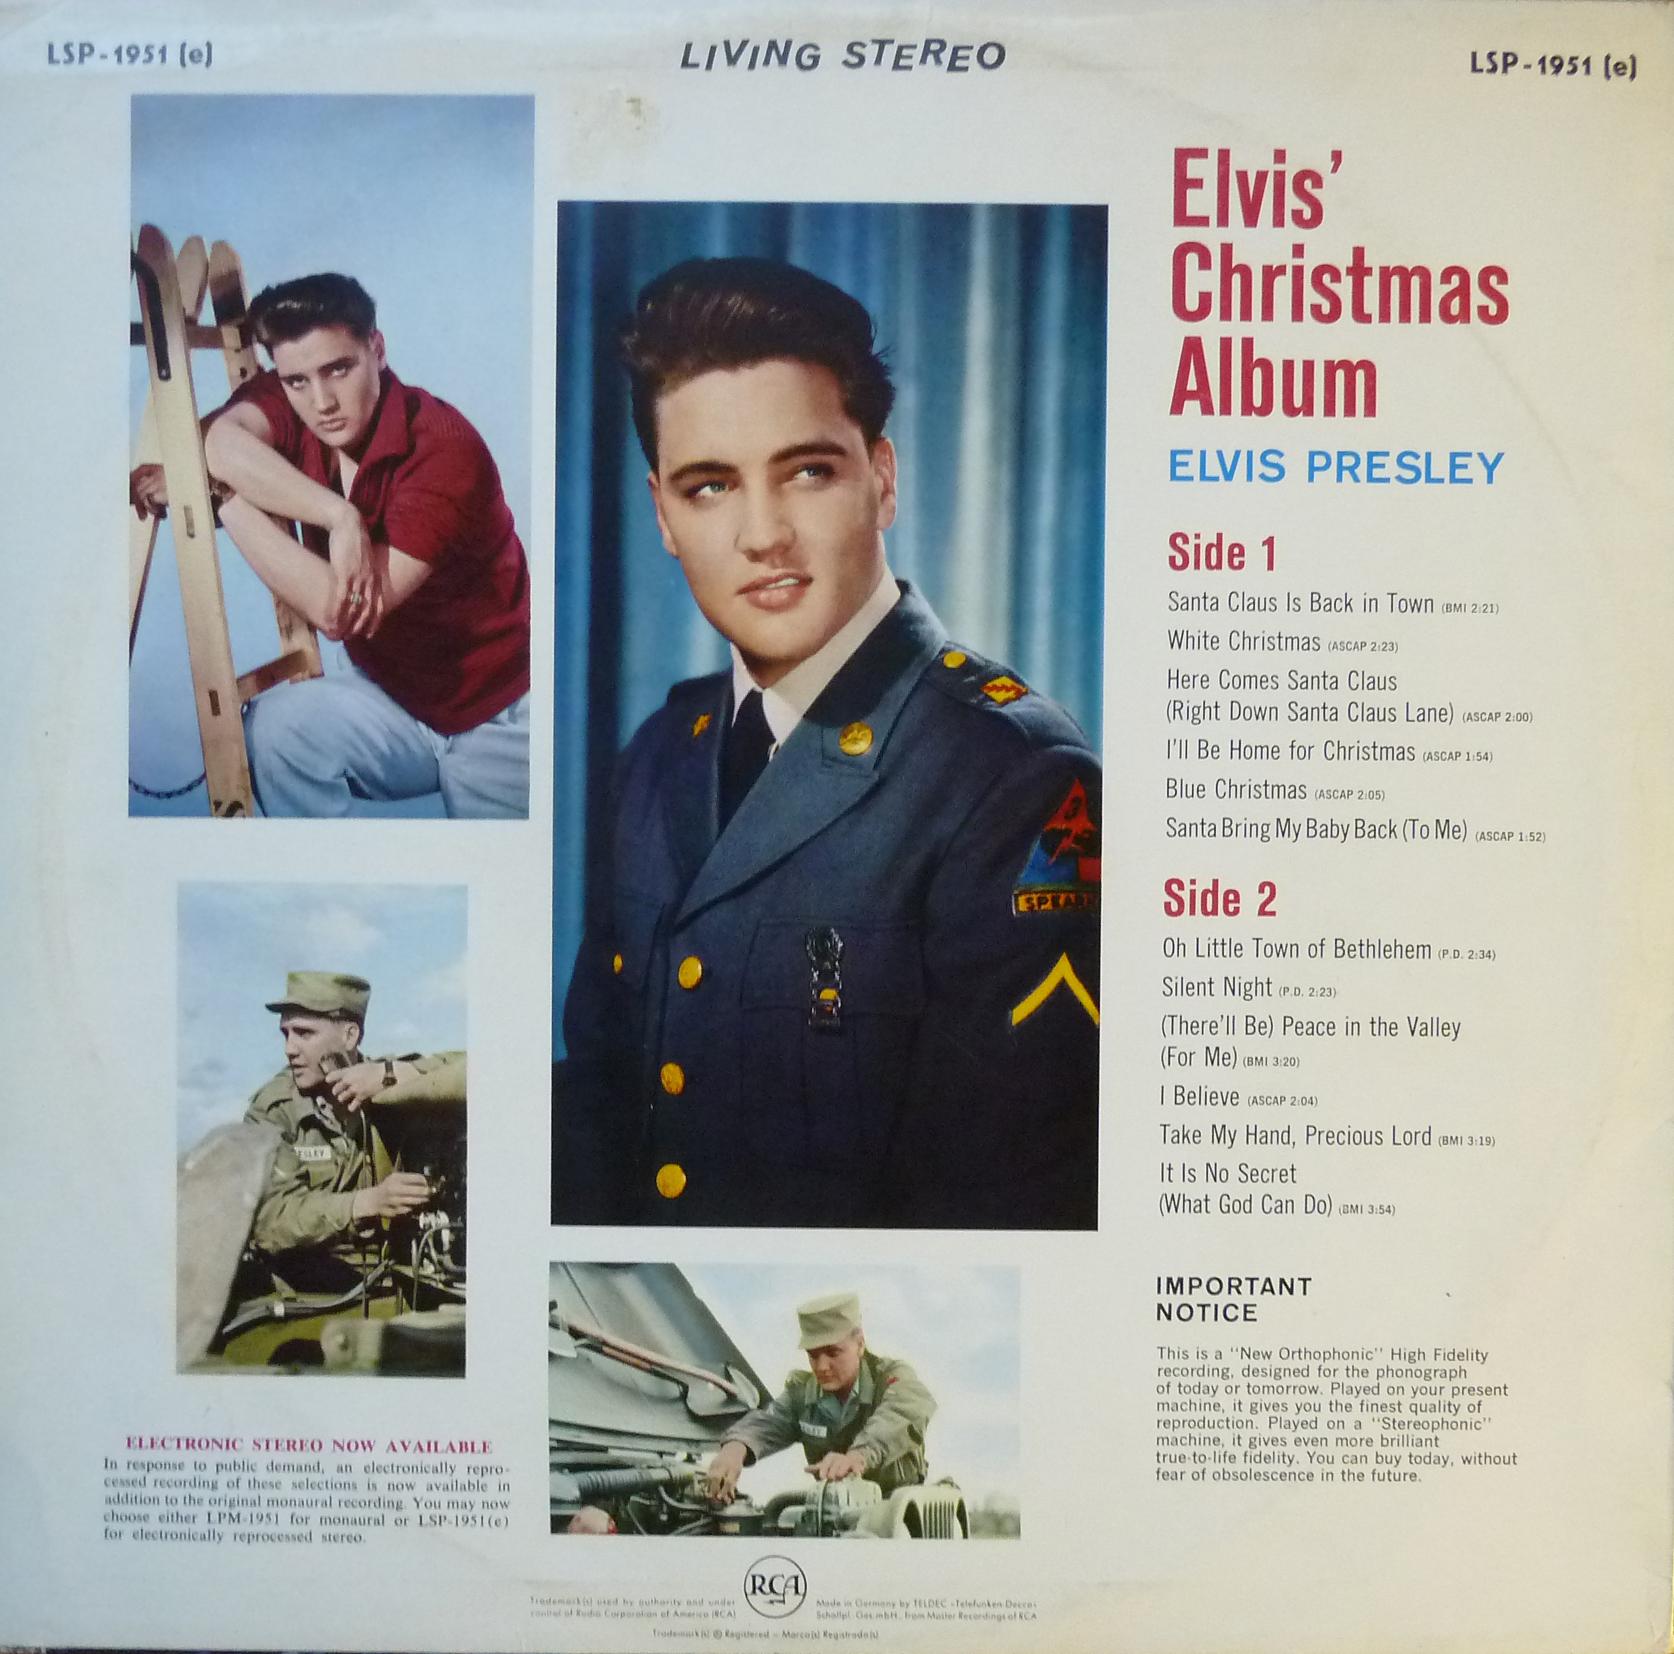 ELVIS' CHRISTMAS ALBUM (1964) Christmasalbum1965v3rfpjmk